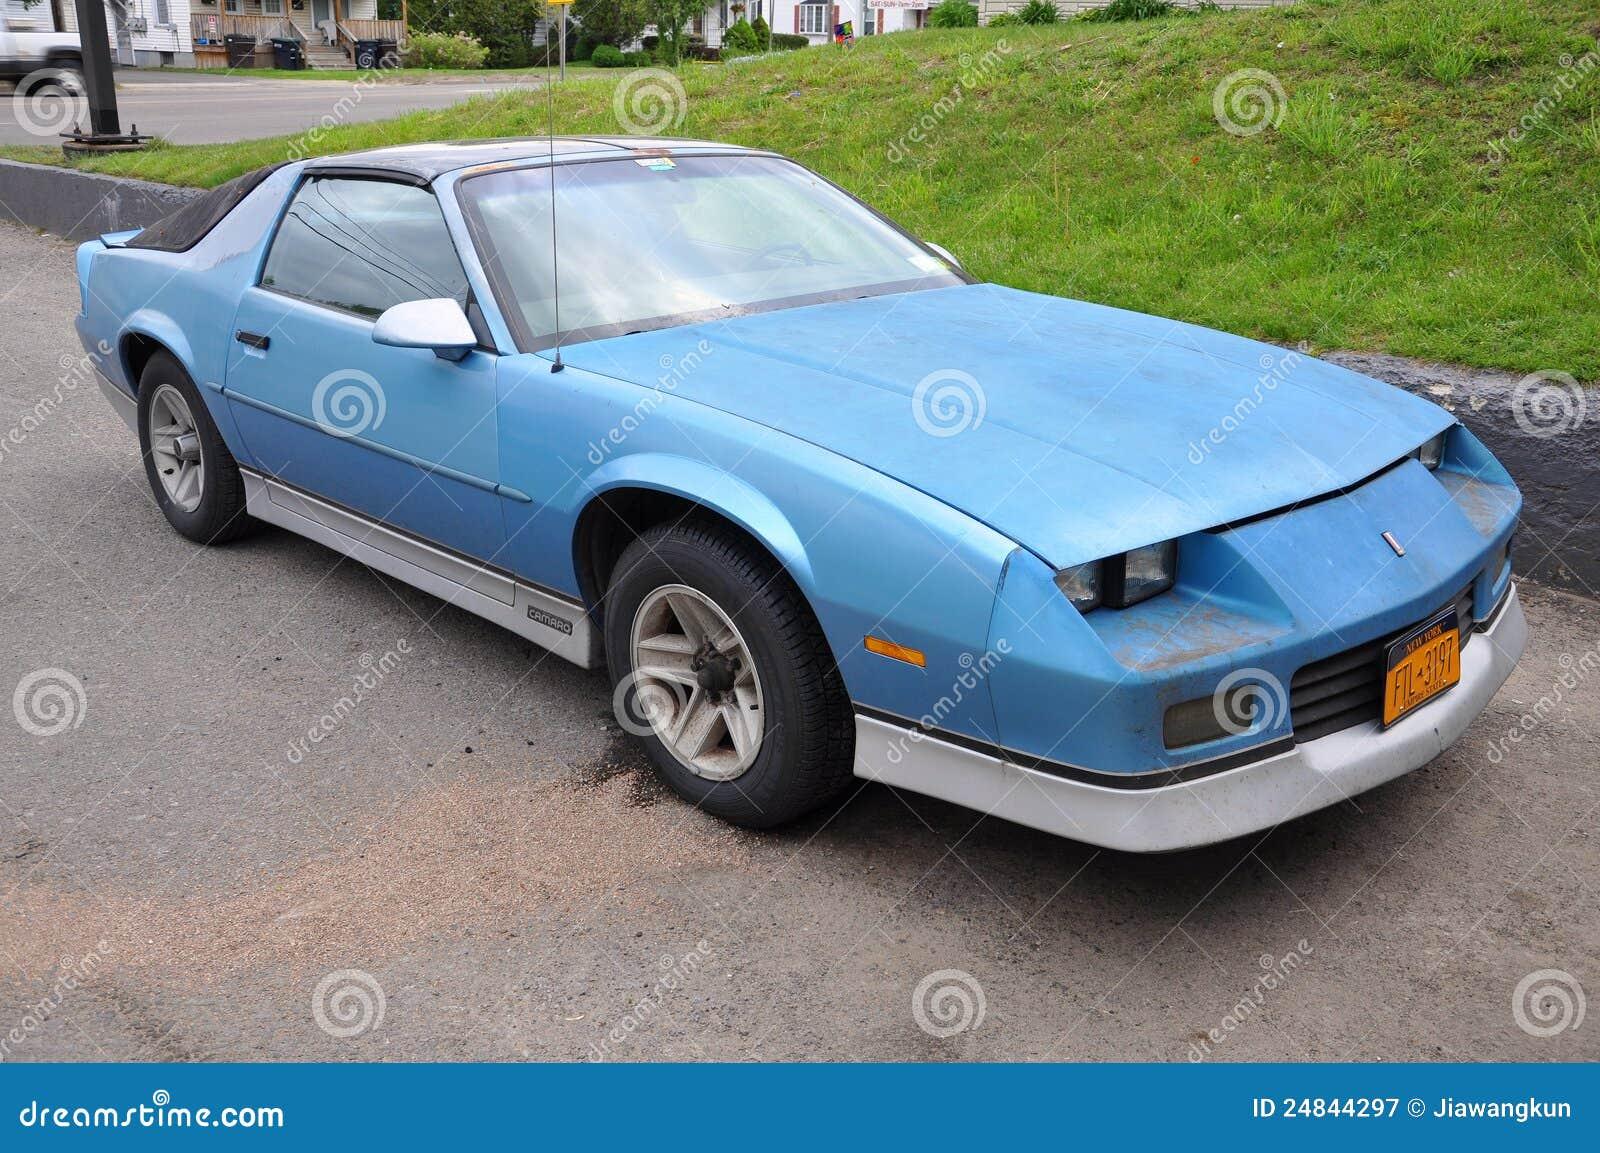 Camaro 1988 chevy camaro : 1988 Chevrolet Camaro Muscle Car Editorial Photography - Image ...